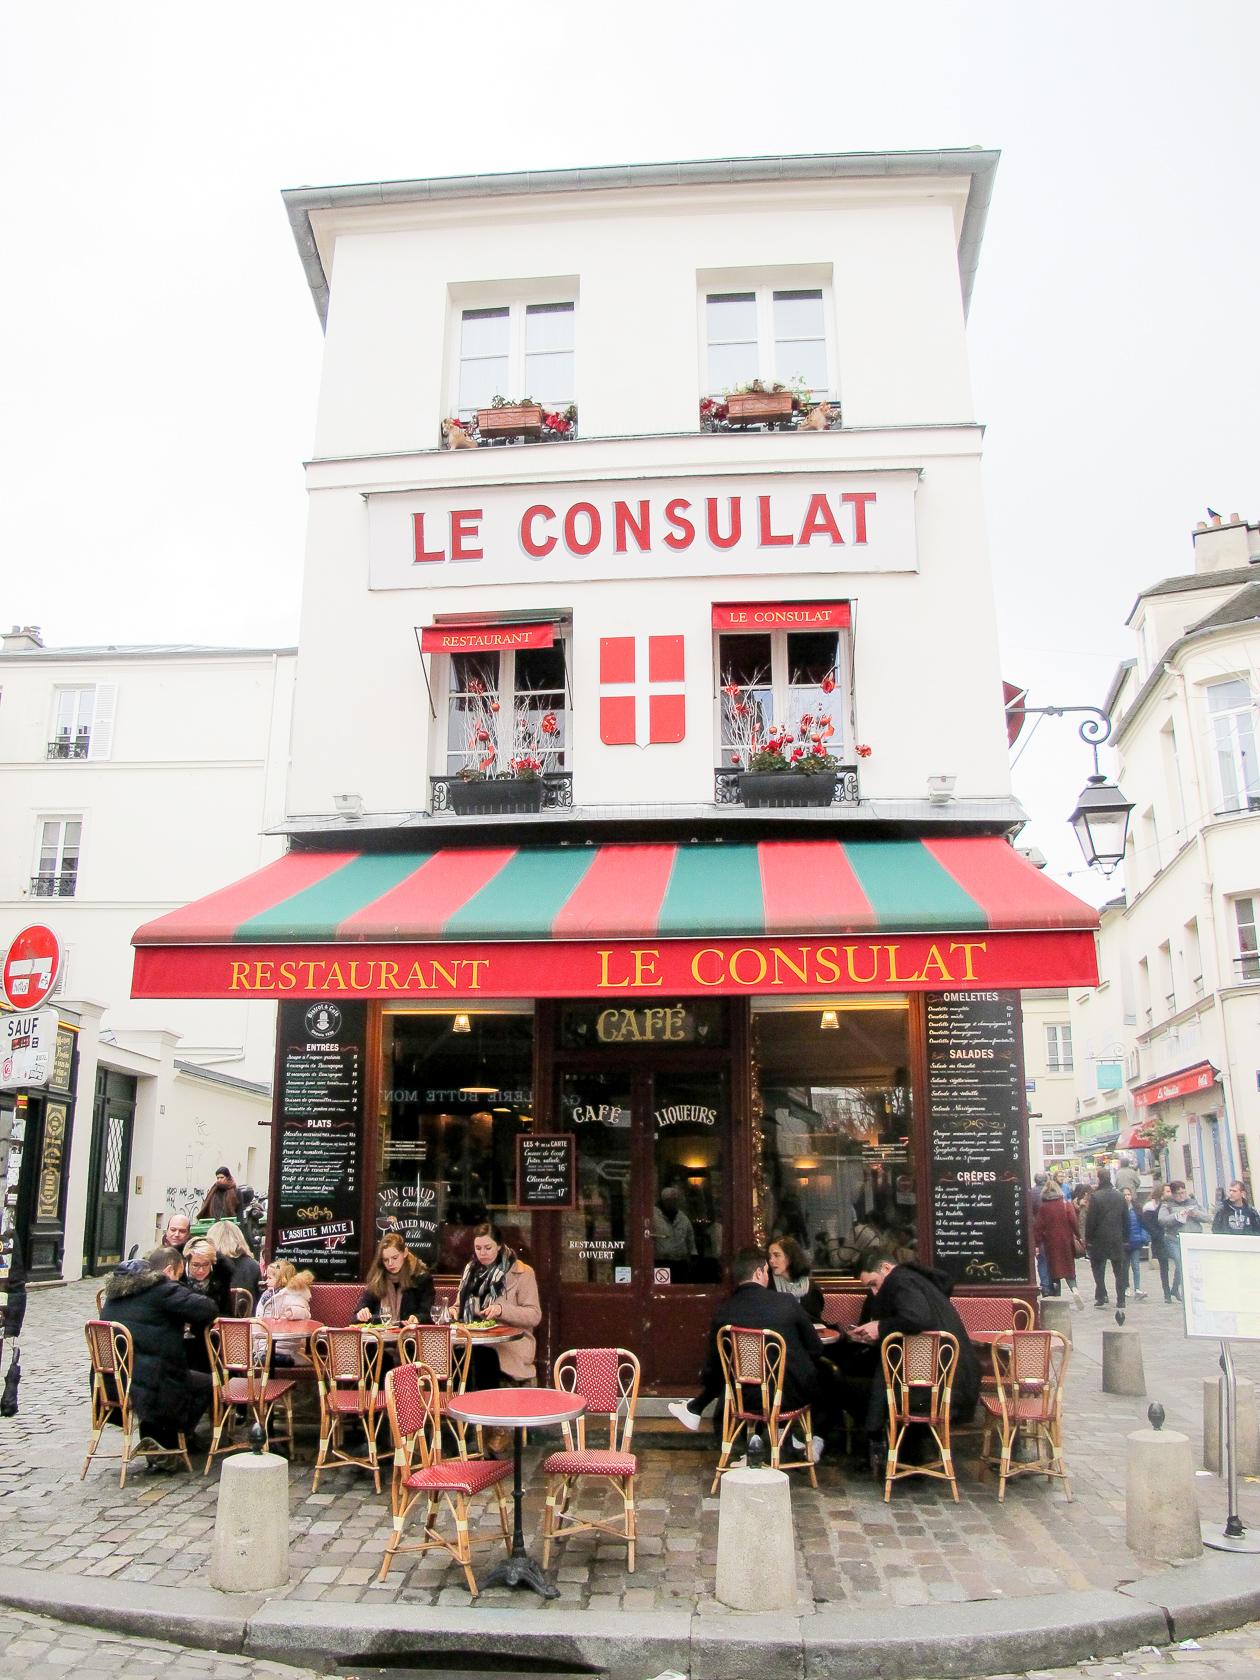 Instagram-famous spot in Montmarte